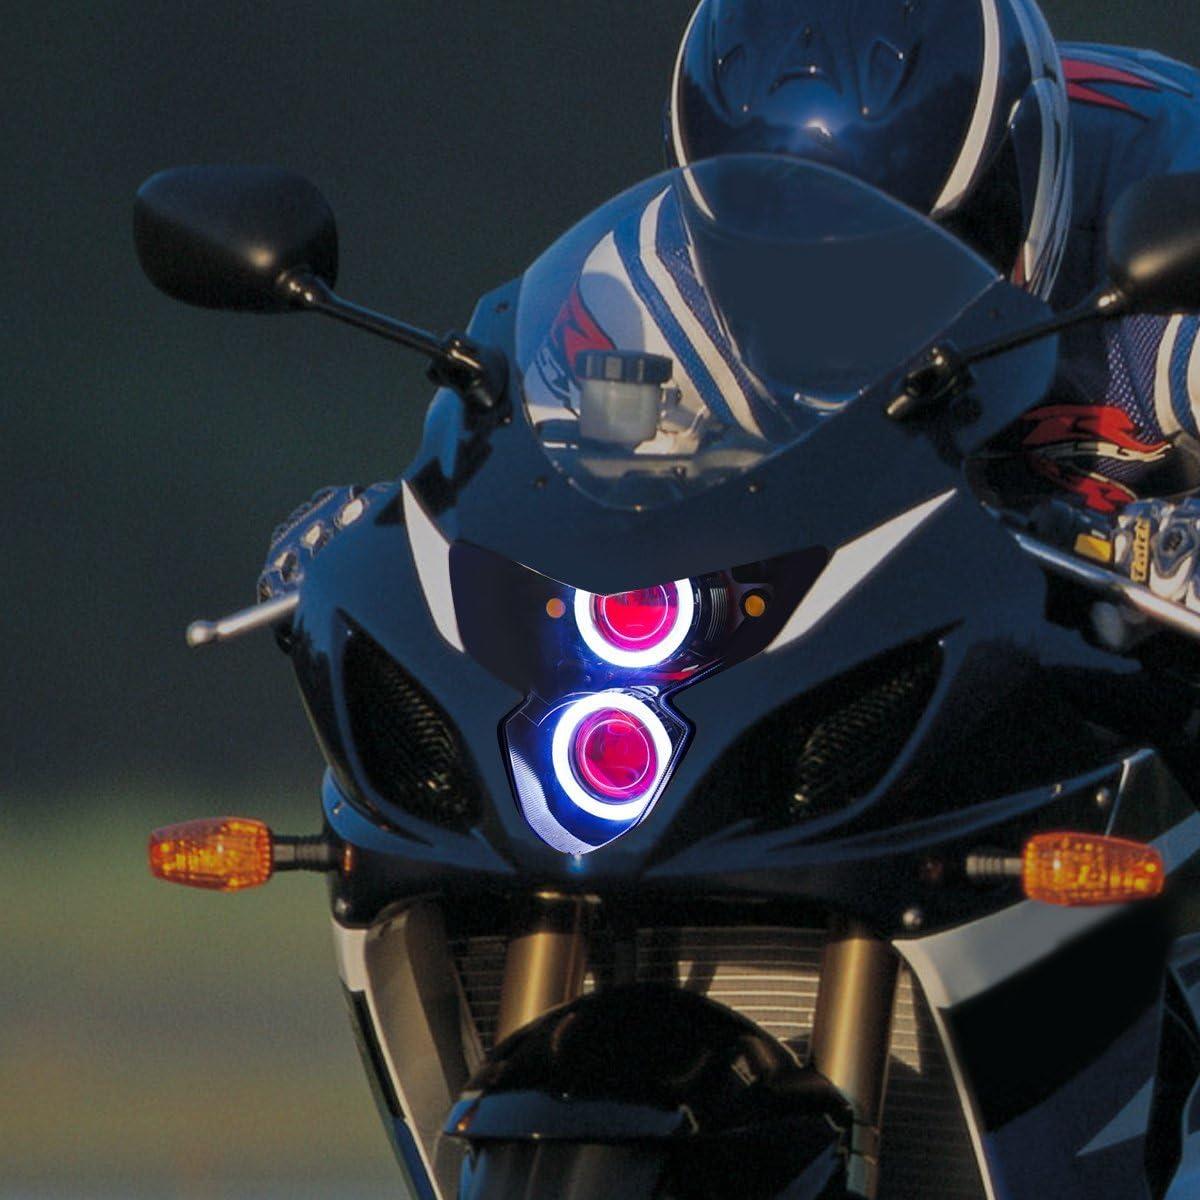 Amazon.com: KT LED Angel Eye Headlight Assembly for Suzuki GSXR600 GSX-R600  2004-2005 Red Demon Eye: Automotive [ 1200 x 1200 Pixel ]